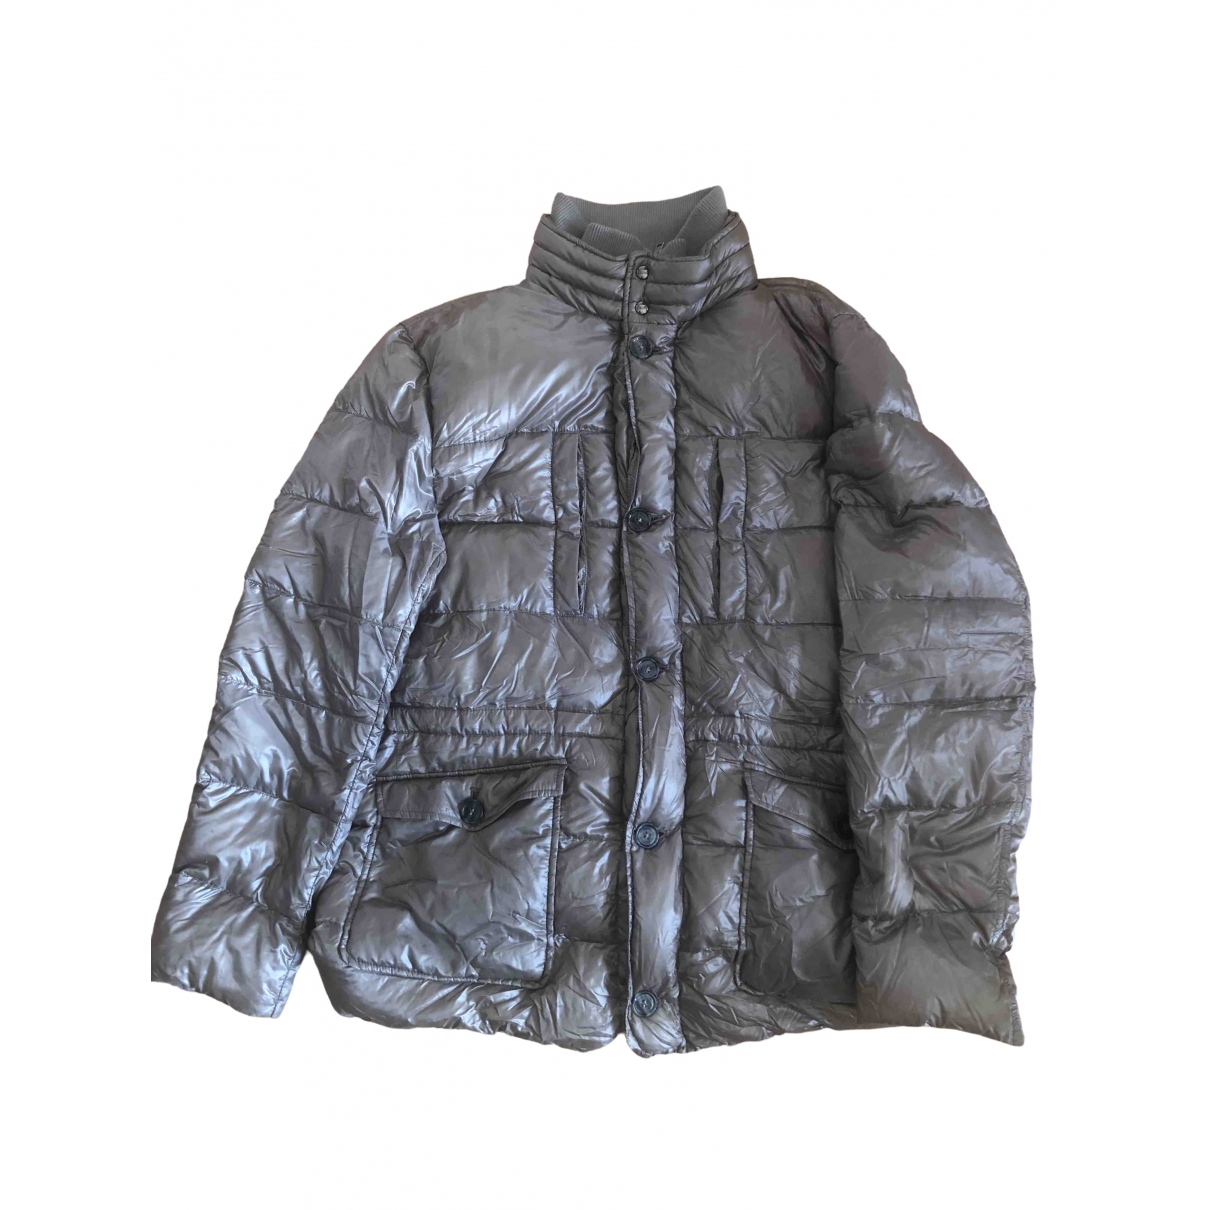 Herno \N Beige jacket  for Men XL International